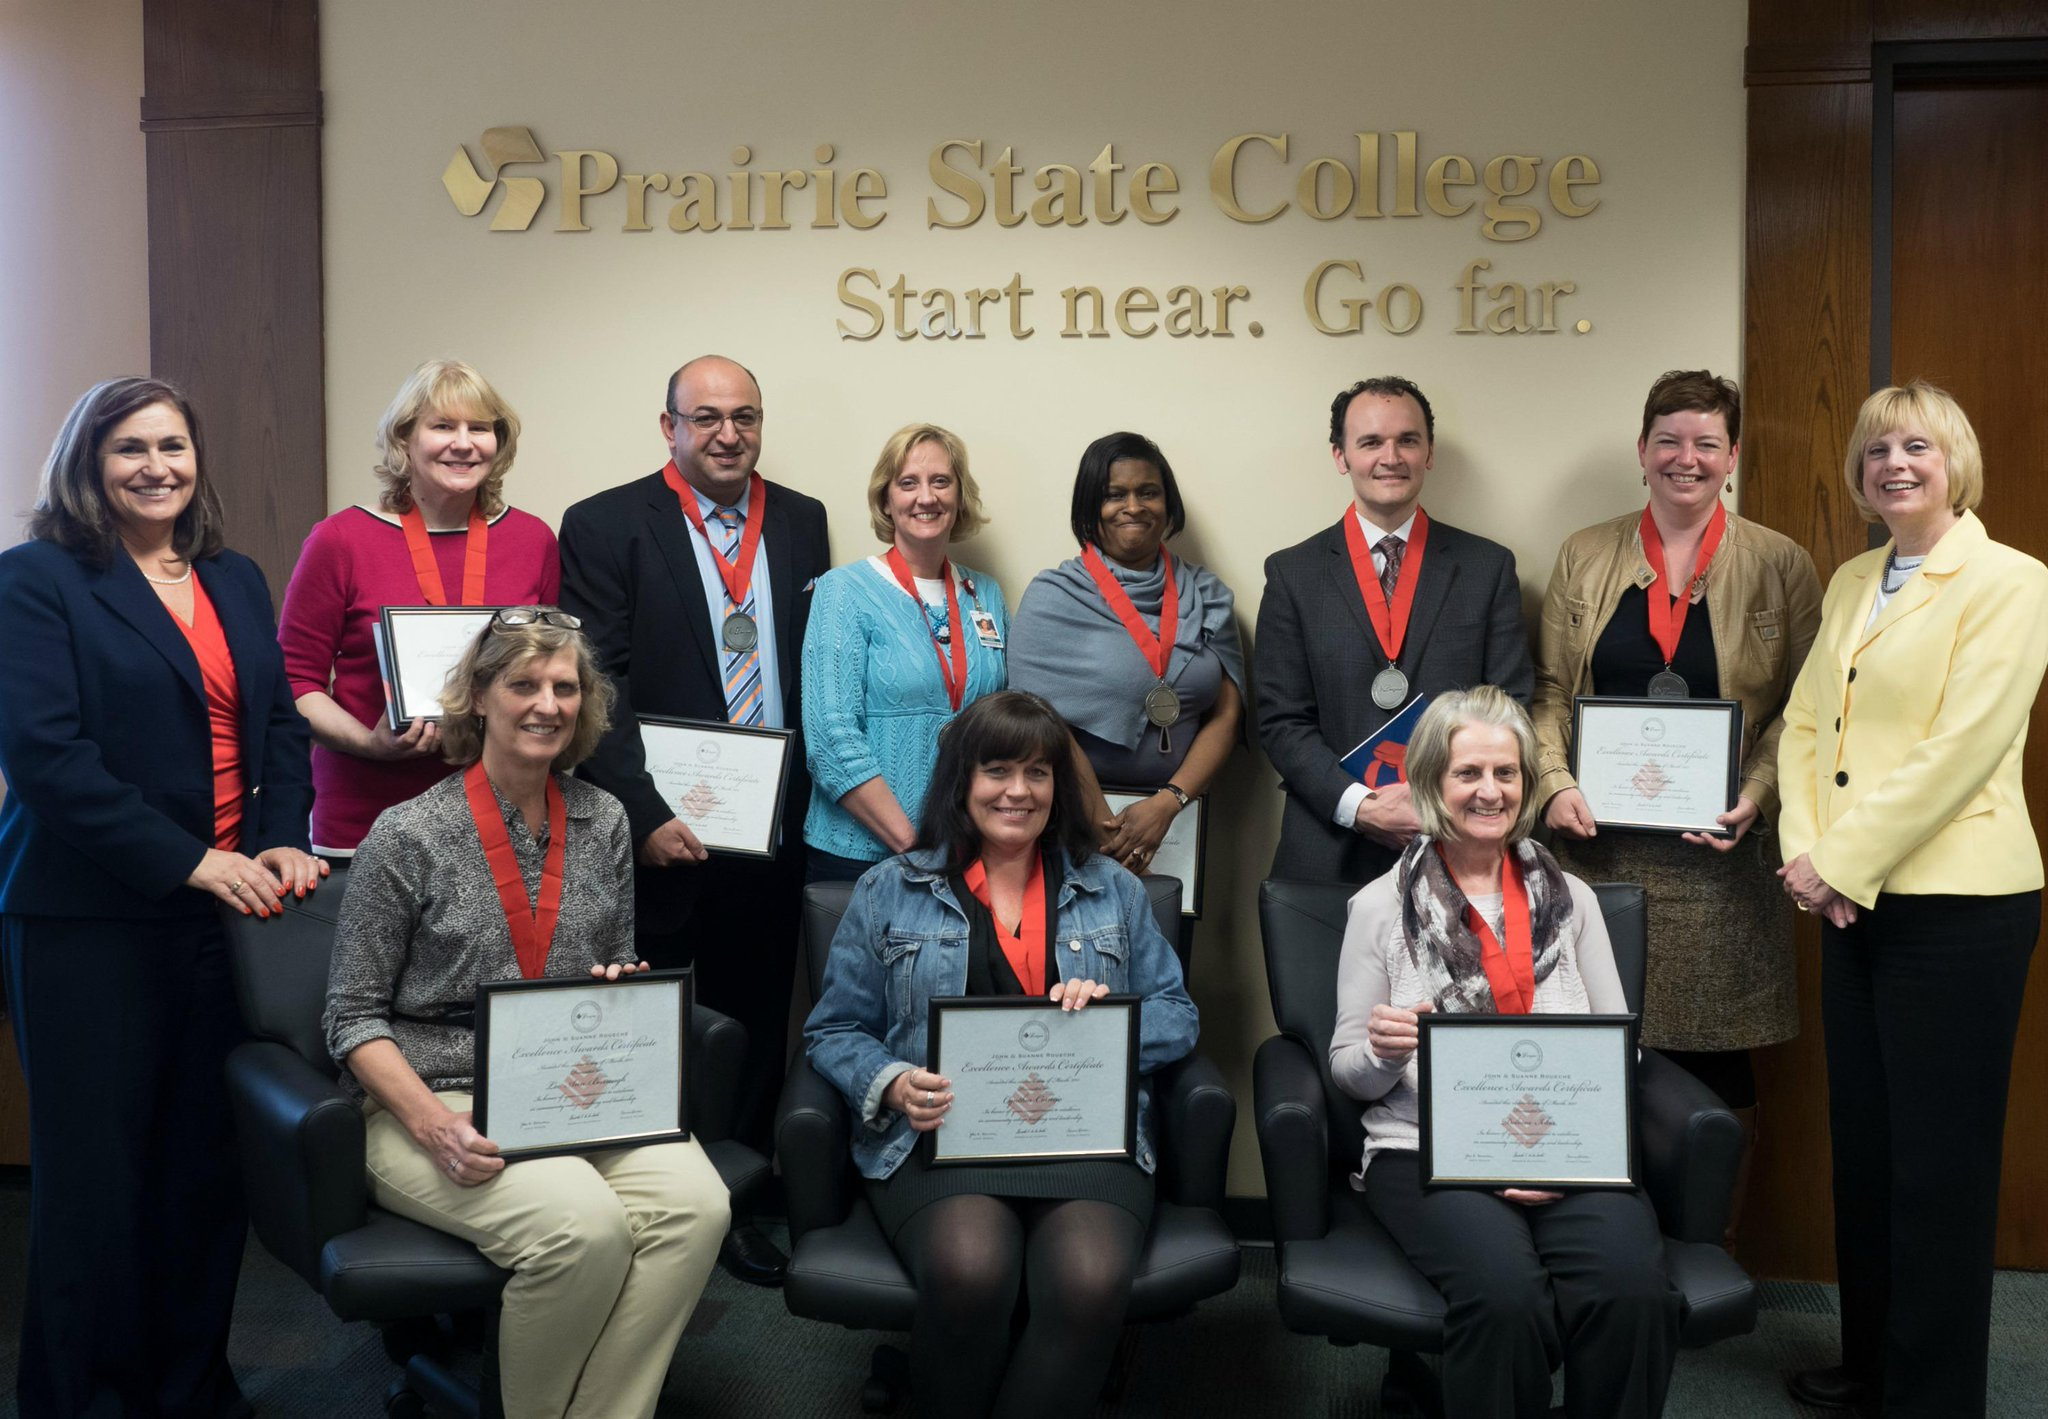 Prairie State College - Wikipedia